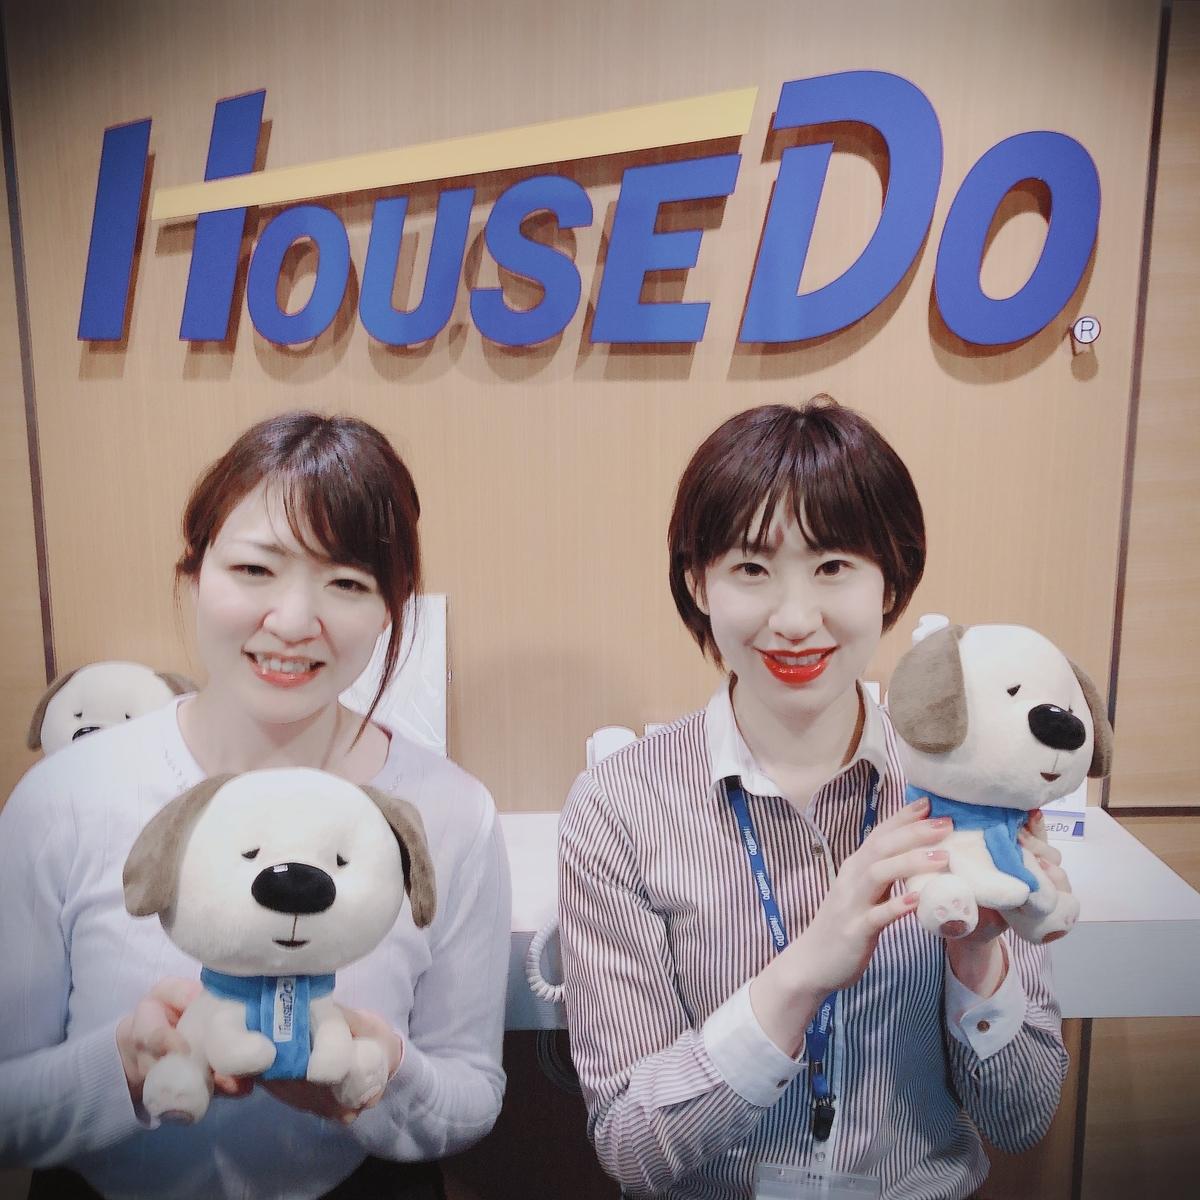 f:id:house_leaseback:20191115164037j:plain